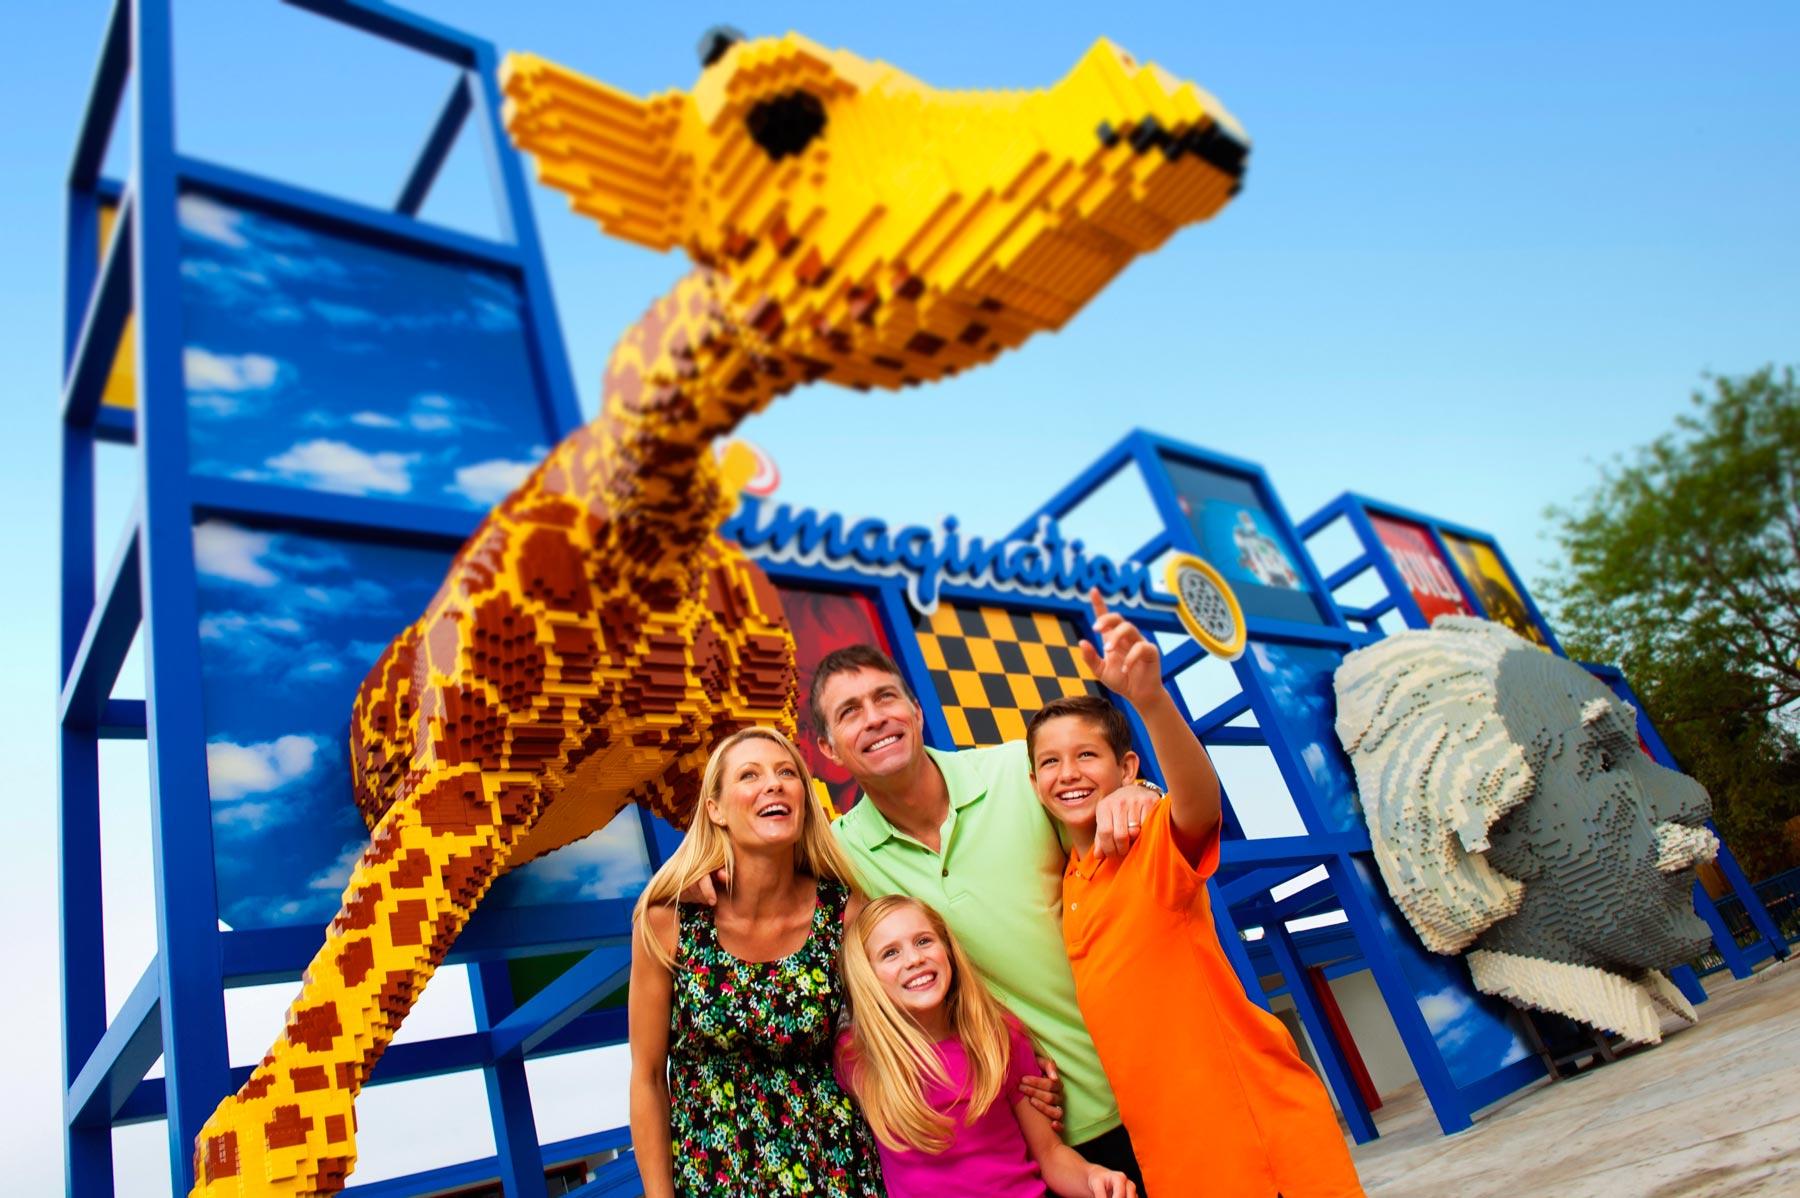 Family in the Legoland